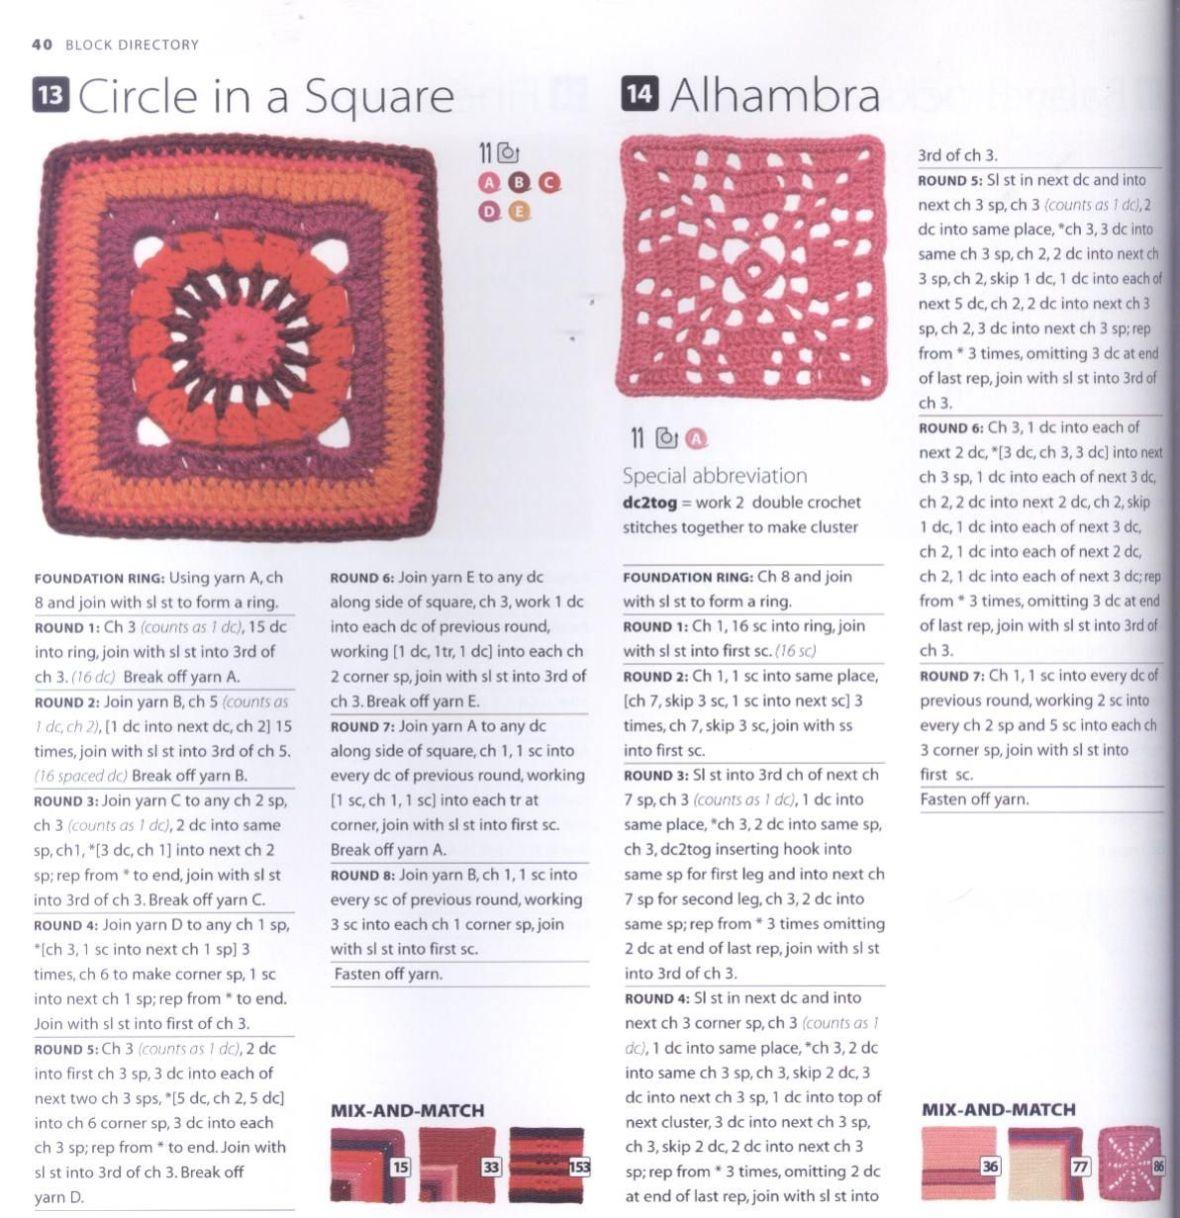 200 Crocheted Blocks for blankets, throws & Afghans 040